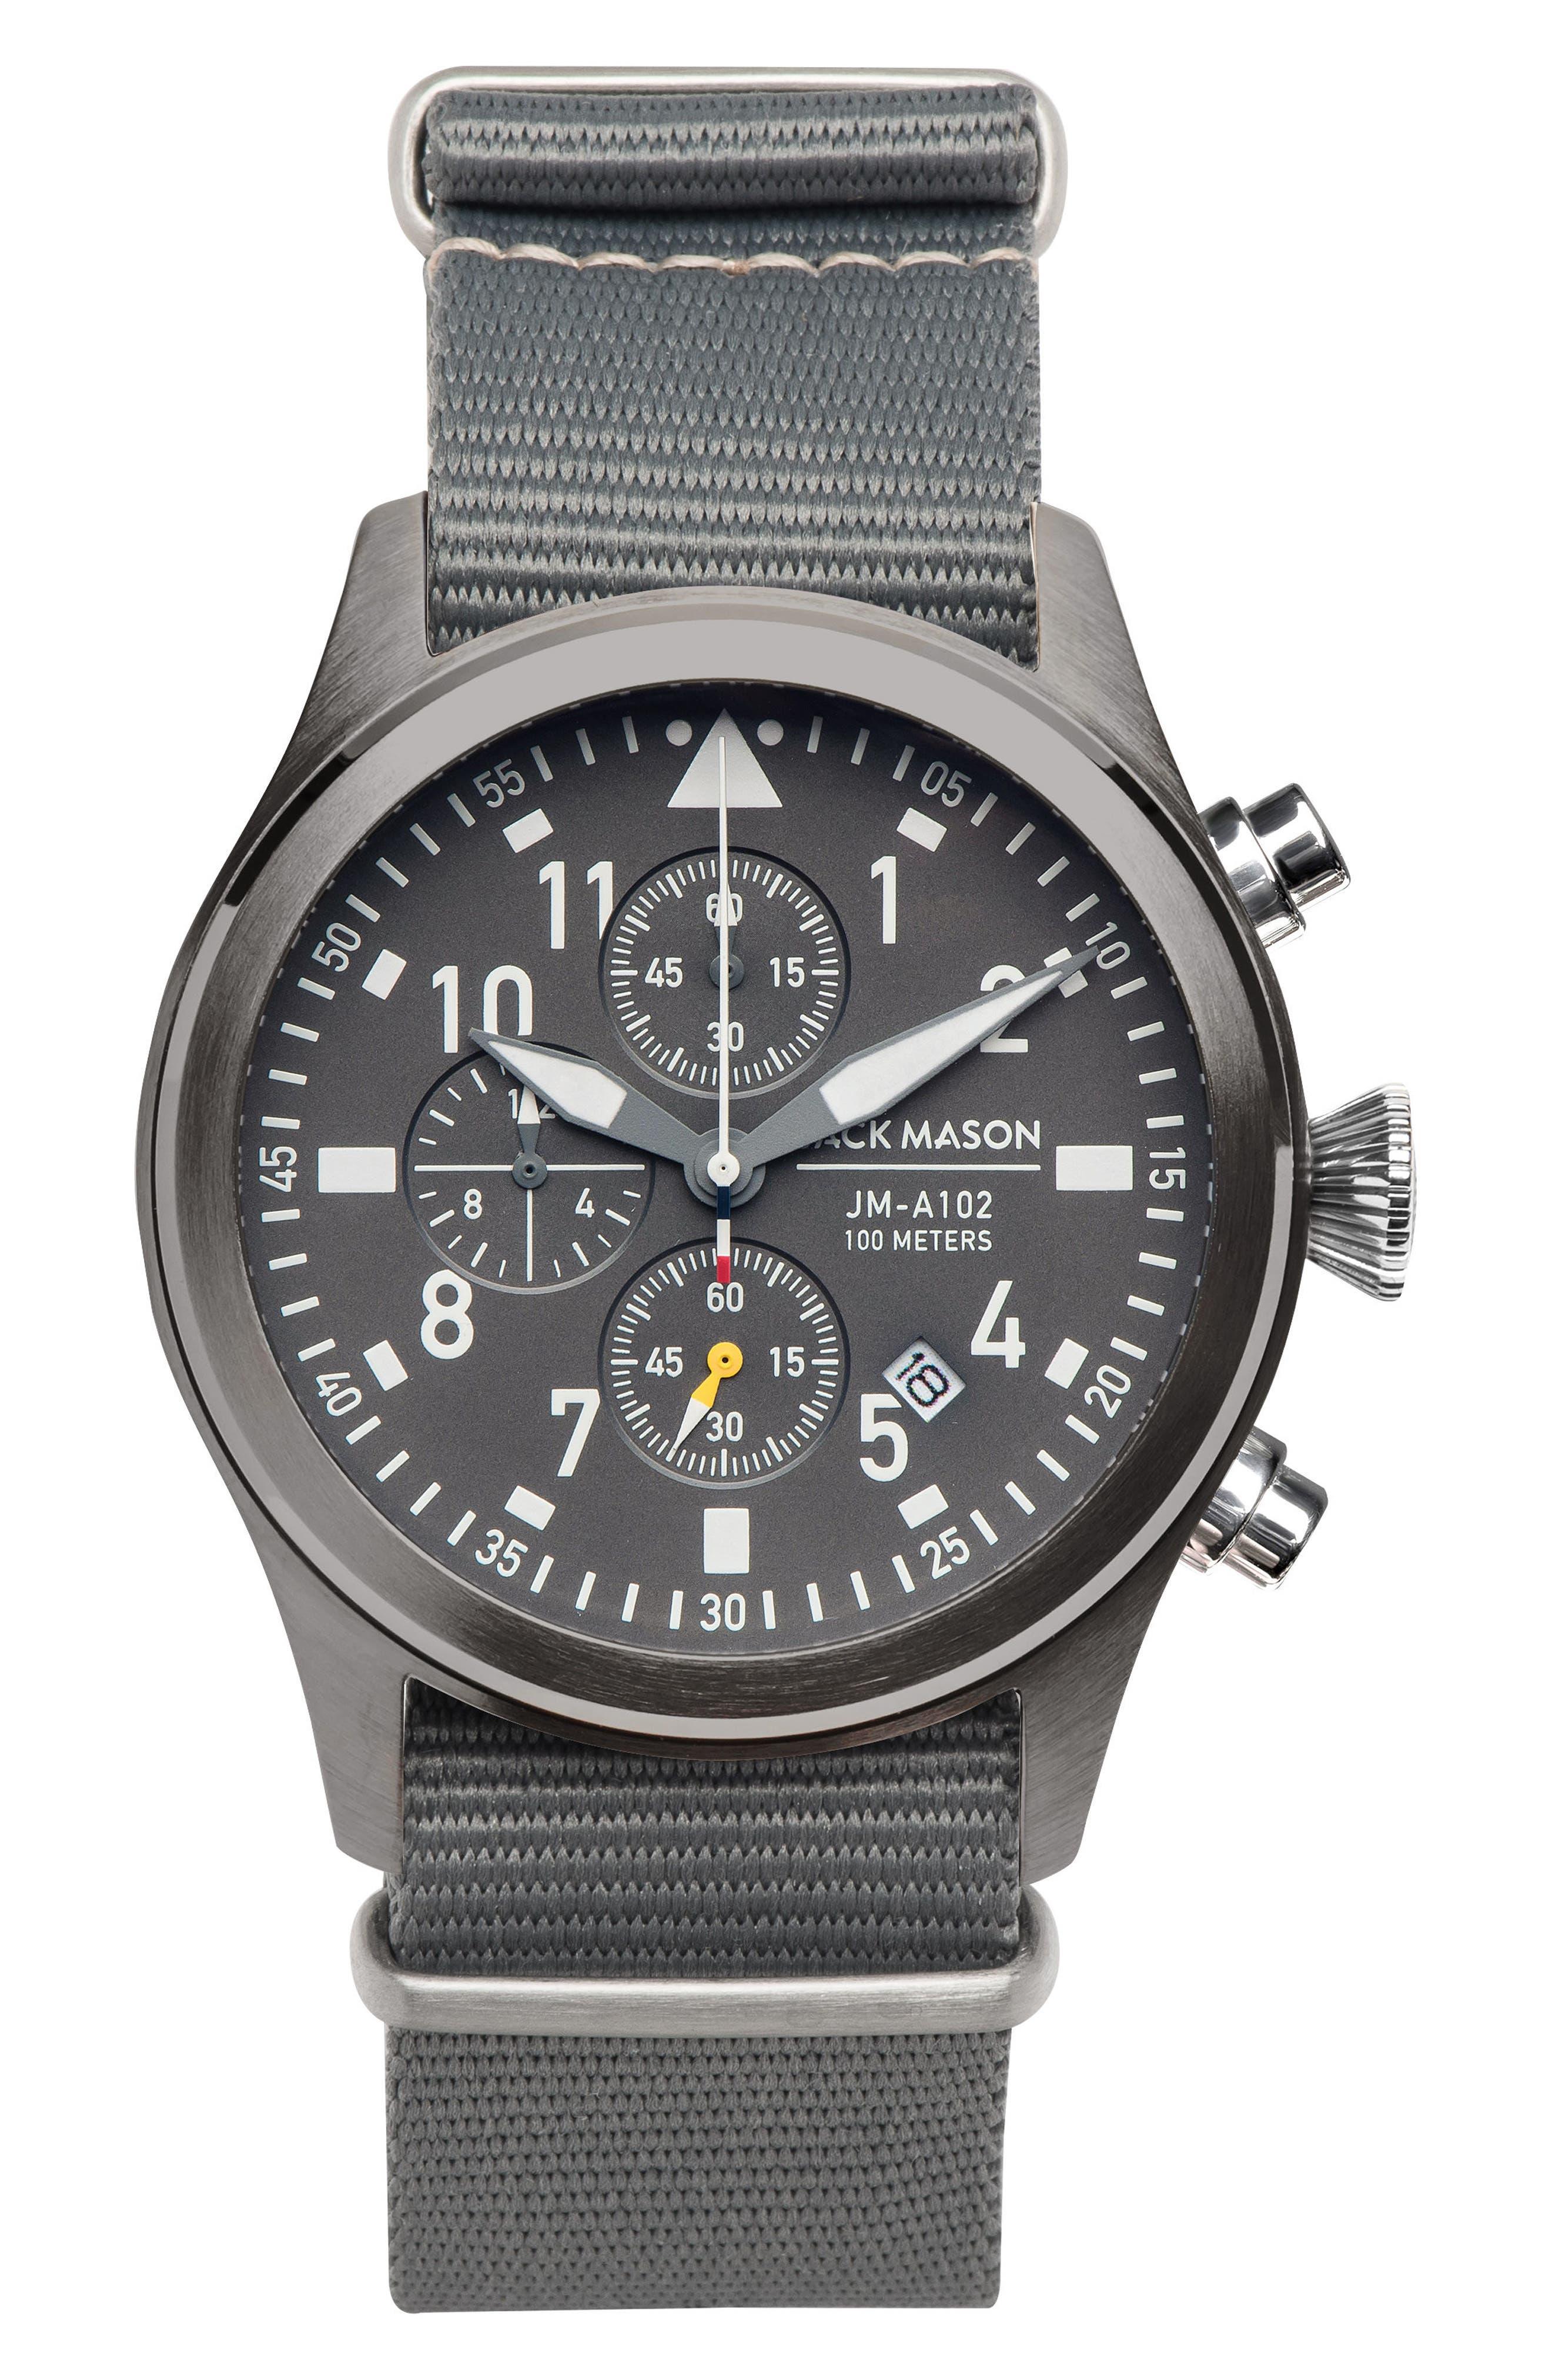 Jack Mason Aviation Chronograph NATO Strap Watch 42mm